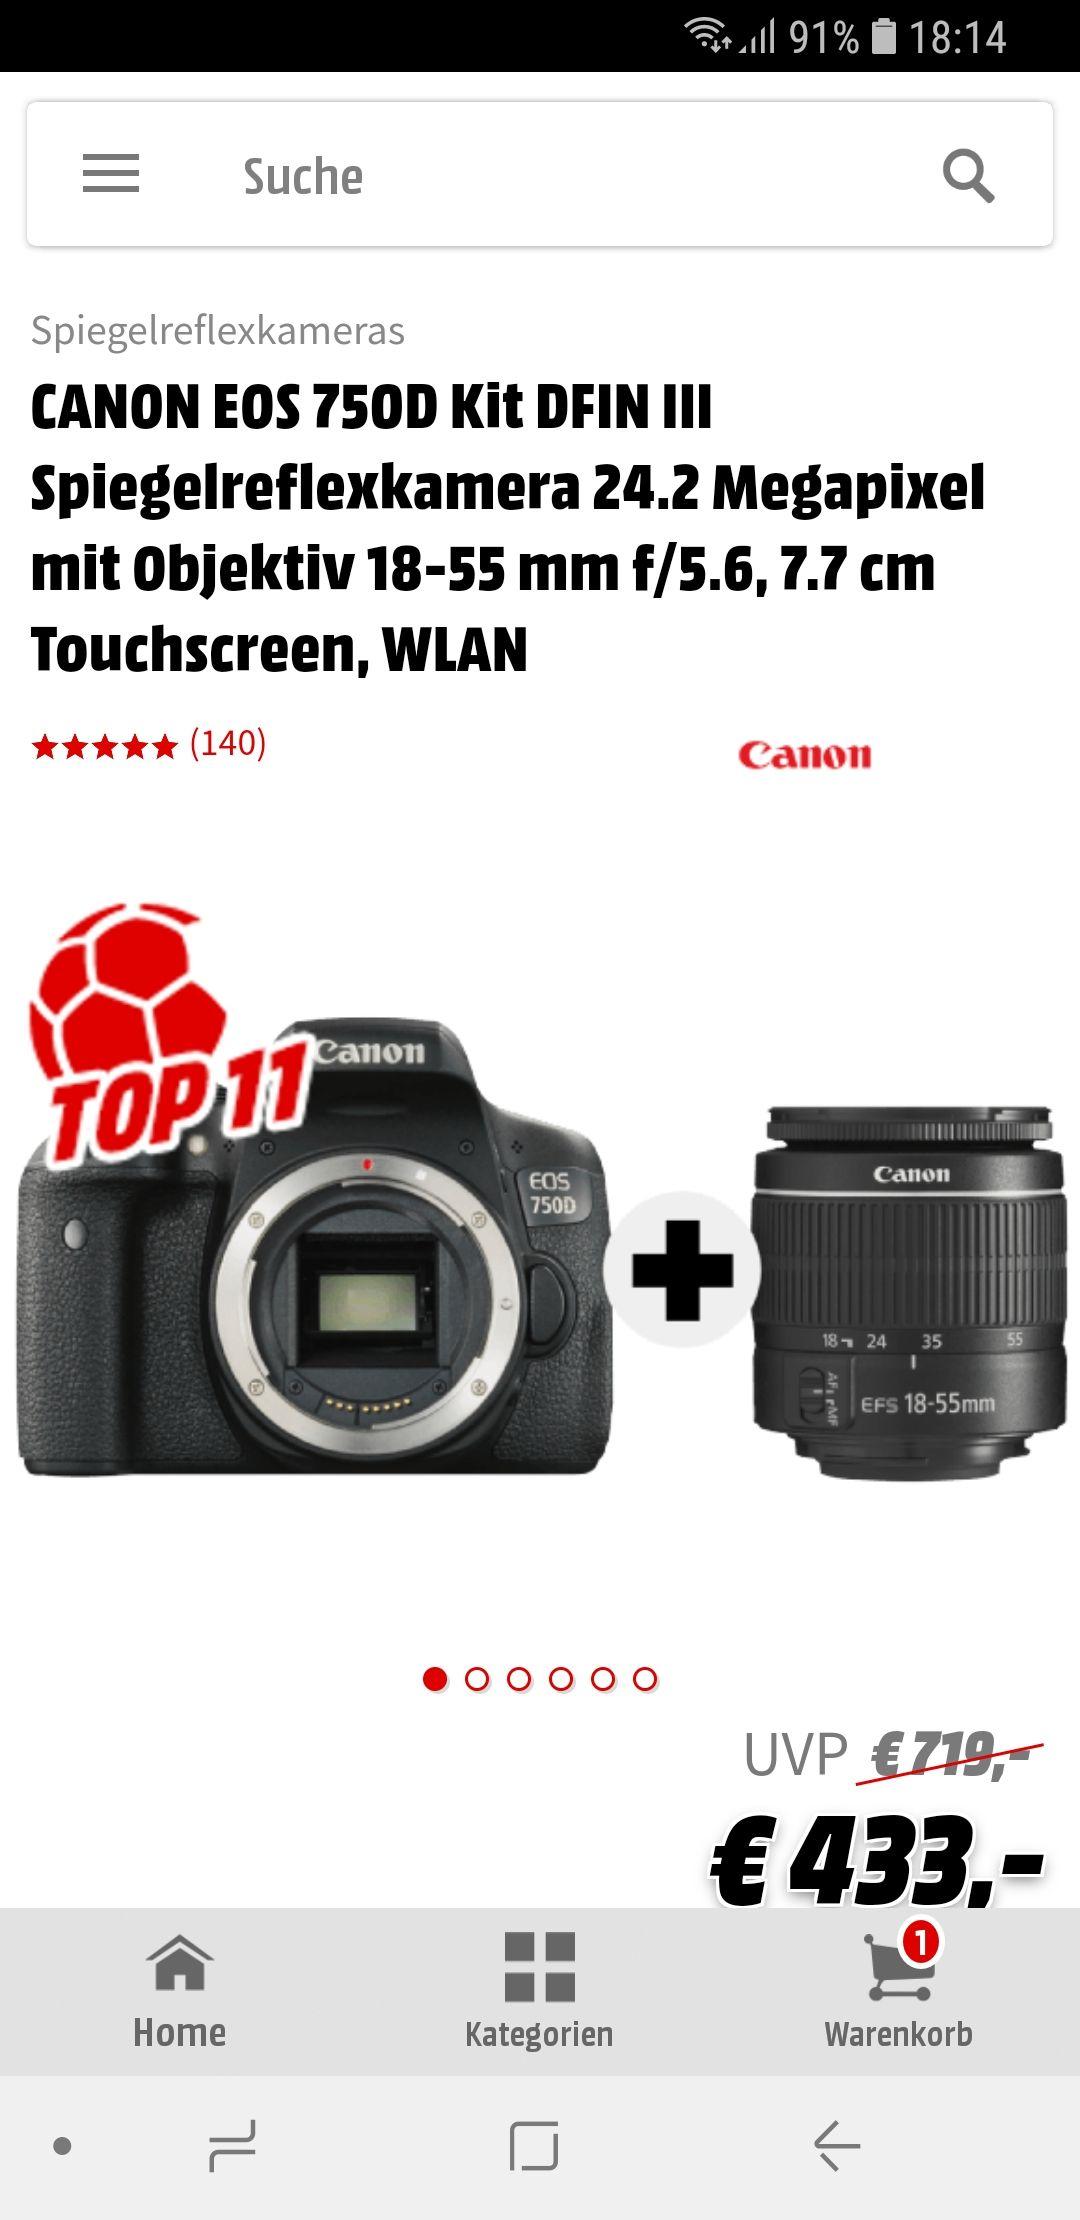 Canon 750D nochmals für 433€